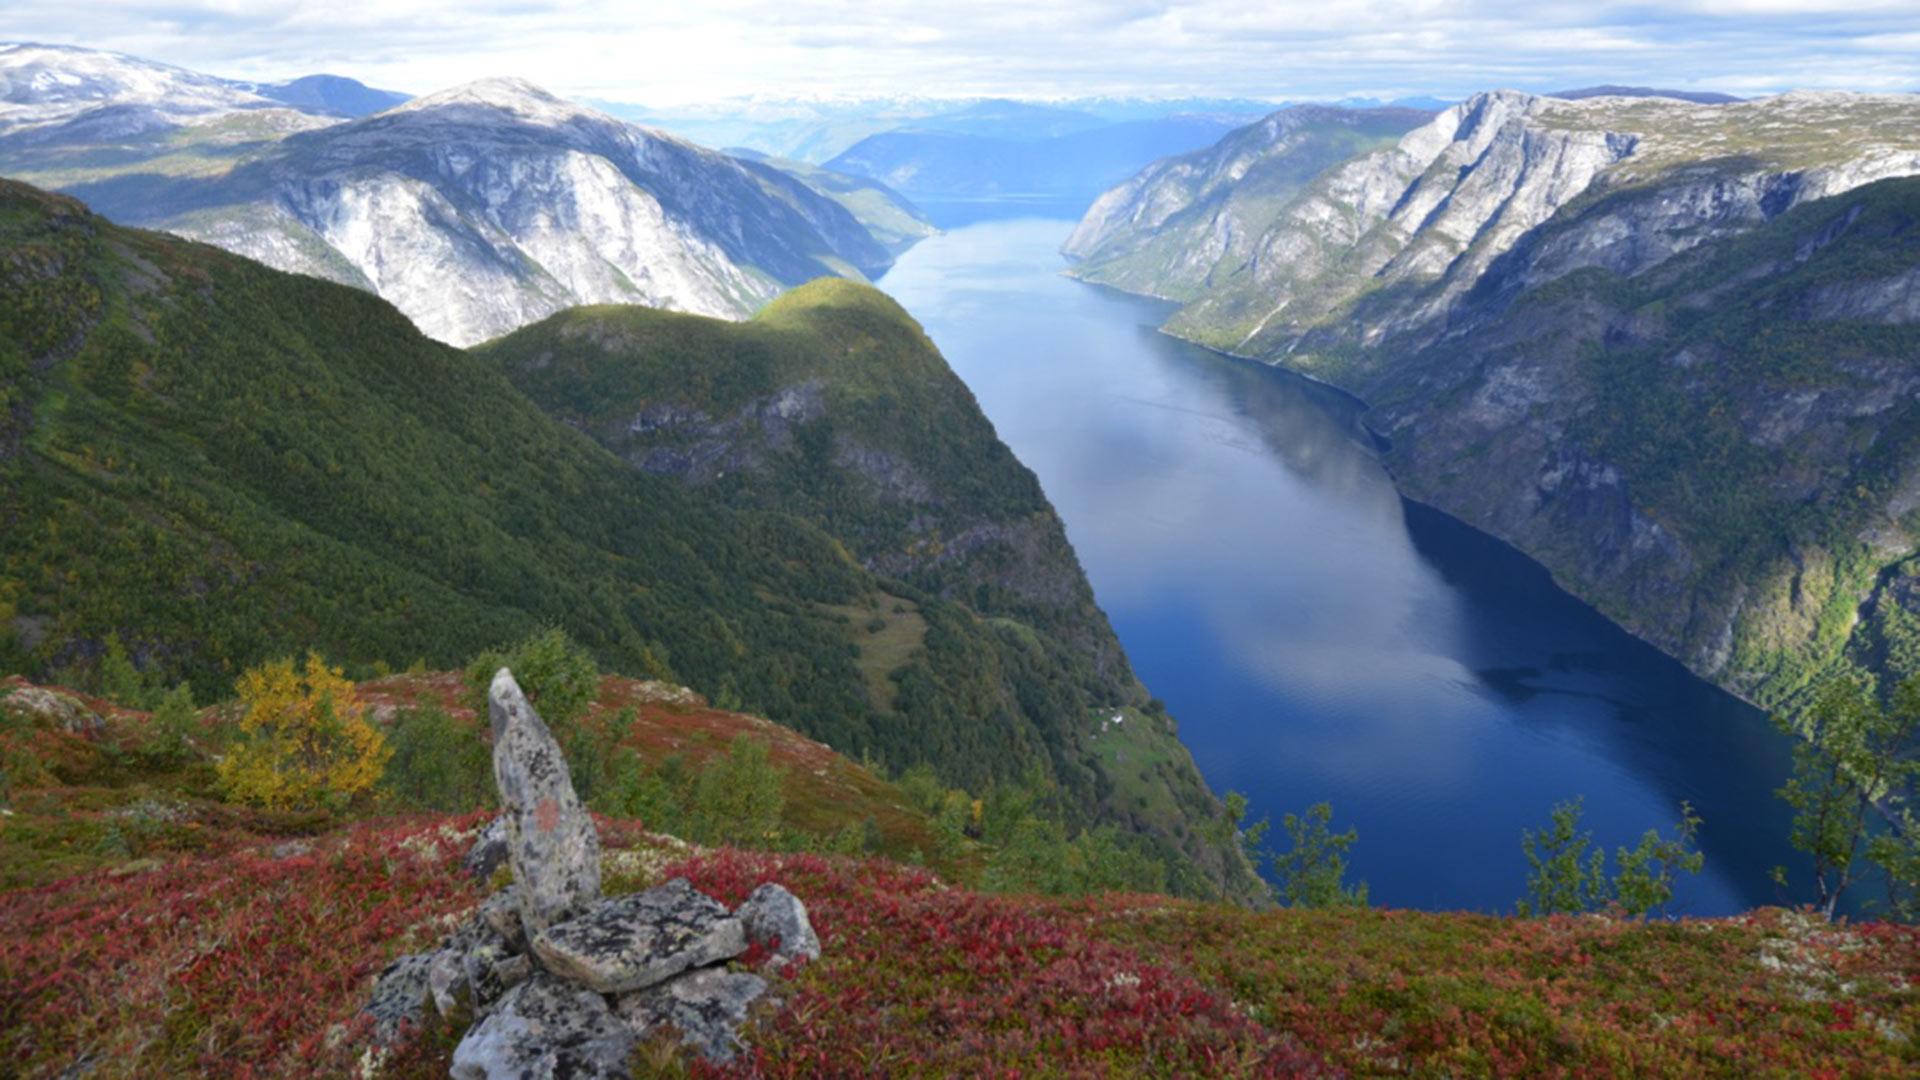 Varde am Berg mit Blick auf den Fjord.